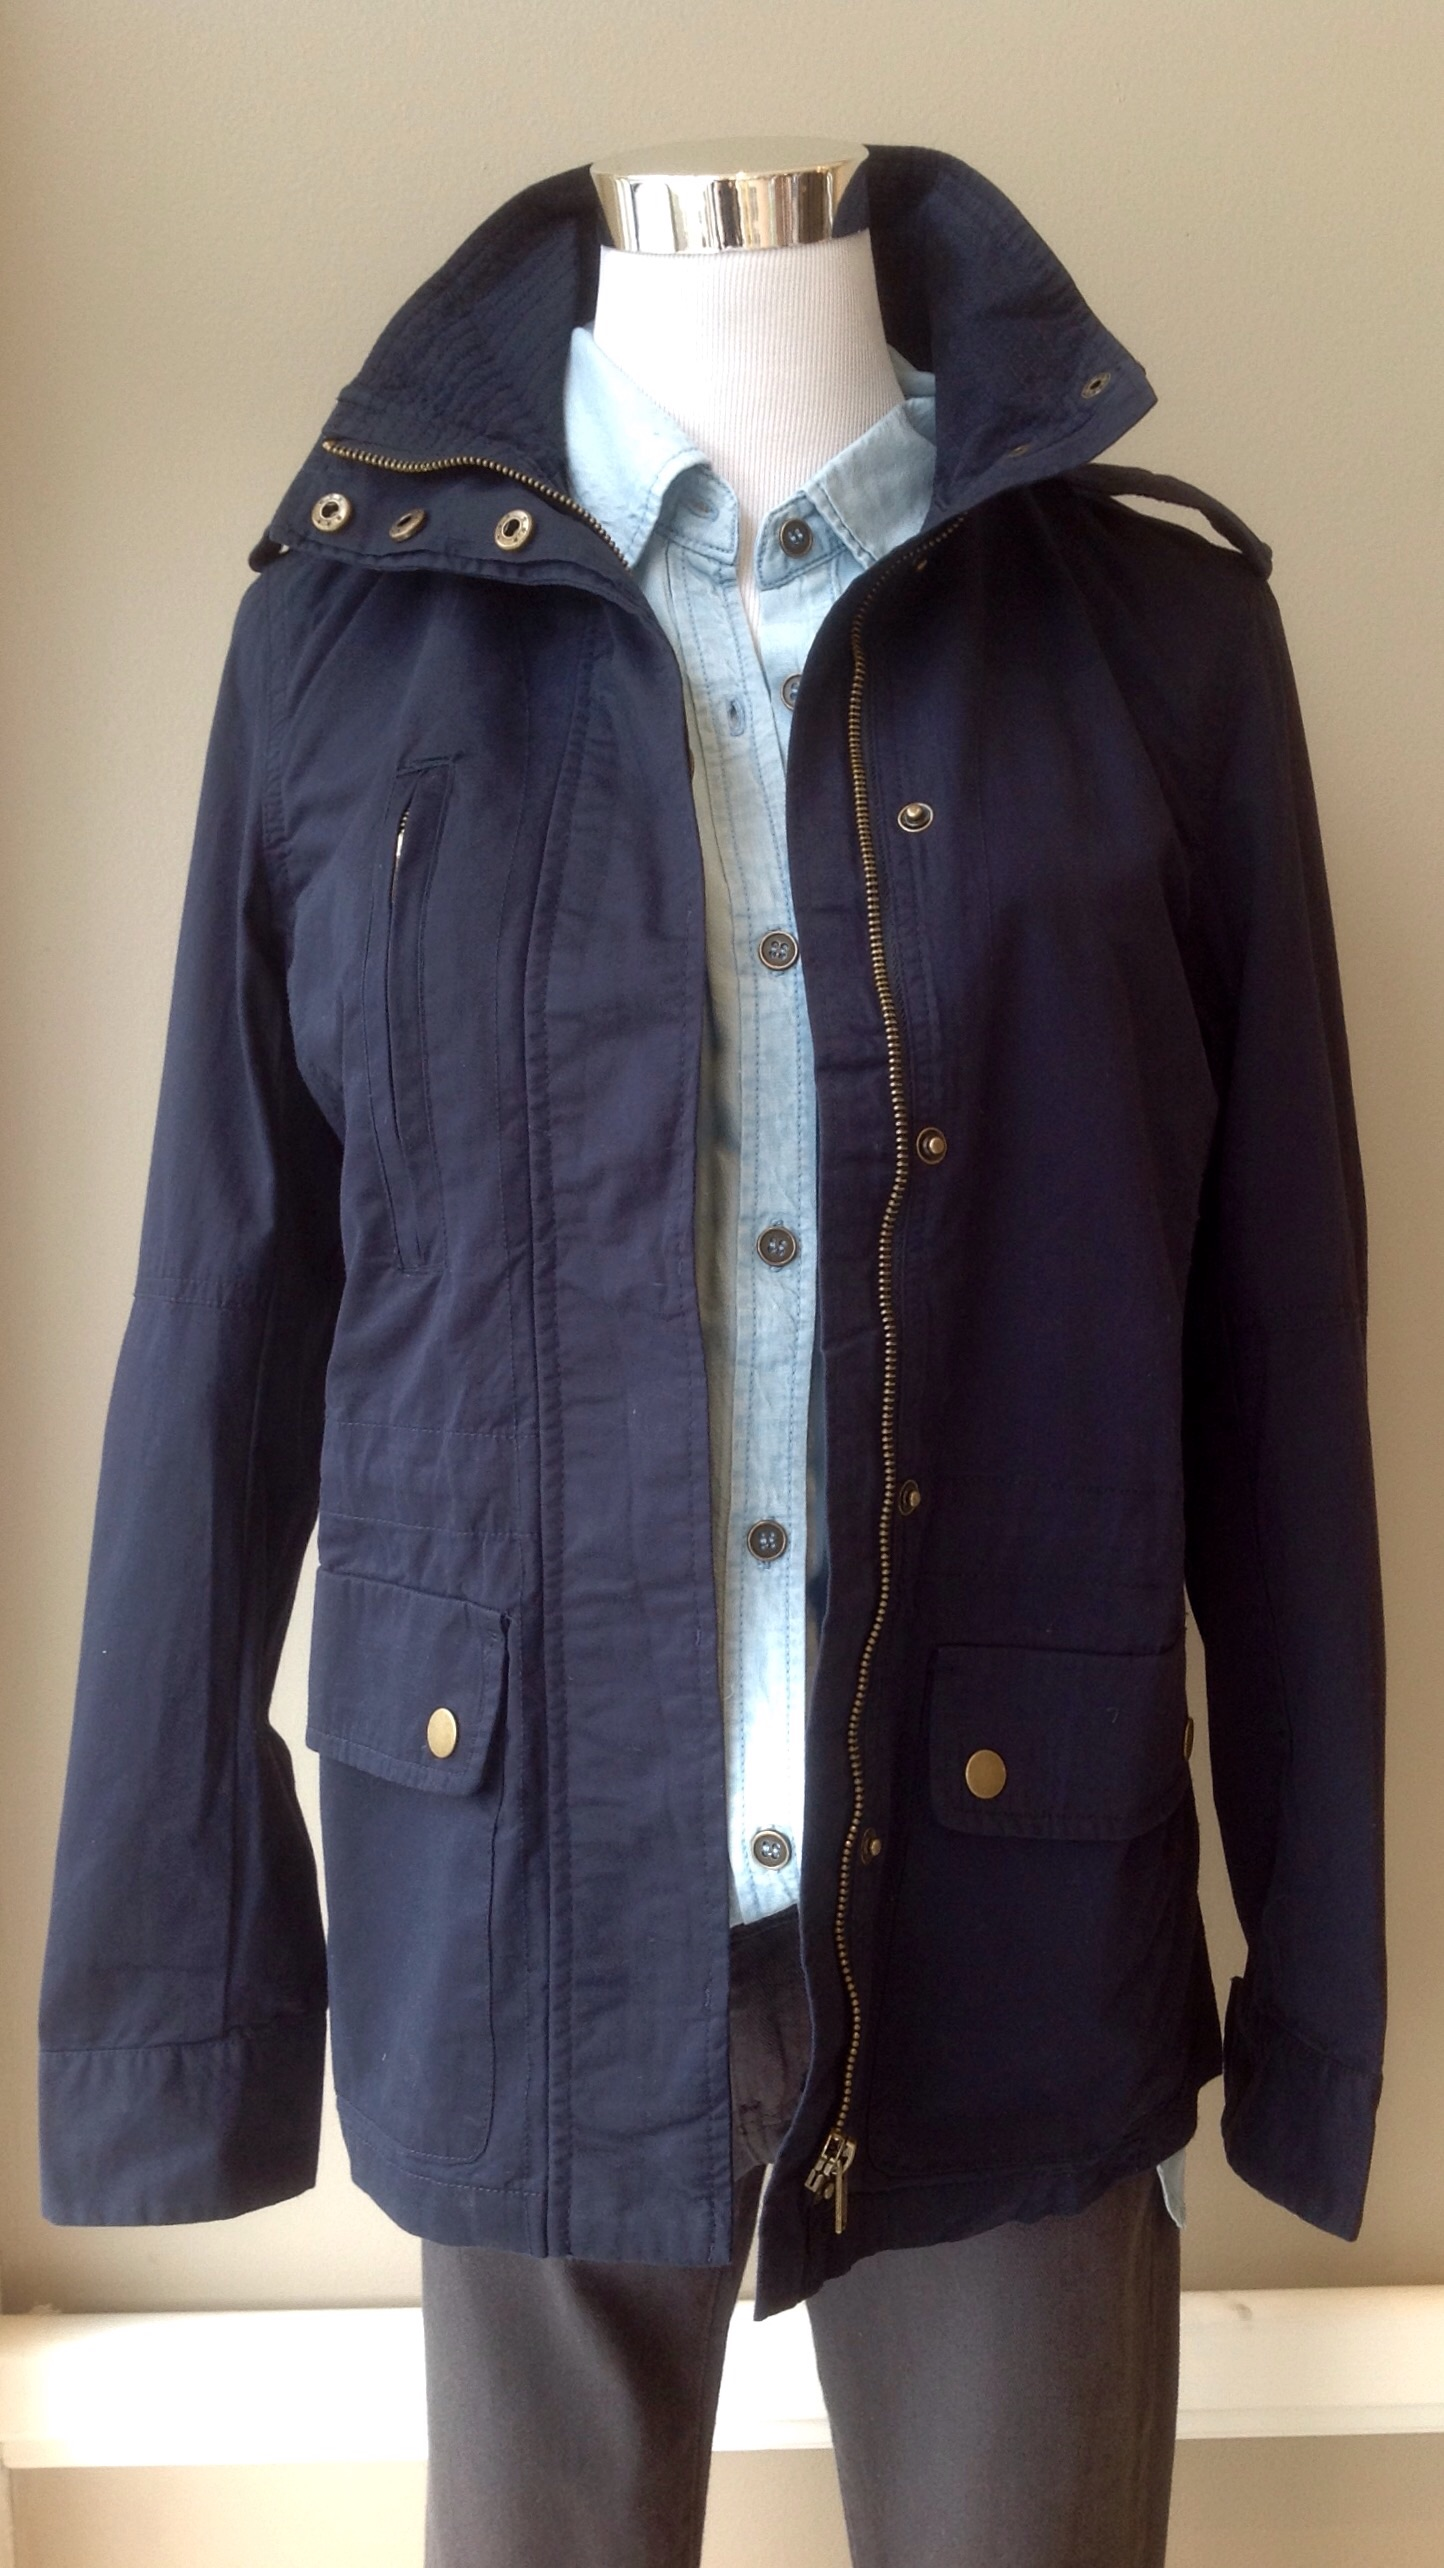 Cotton field jacket in Navy, $45